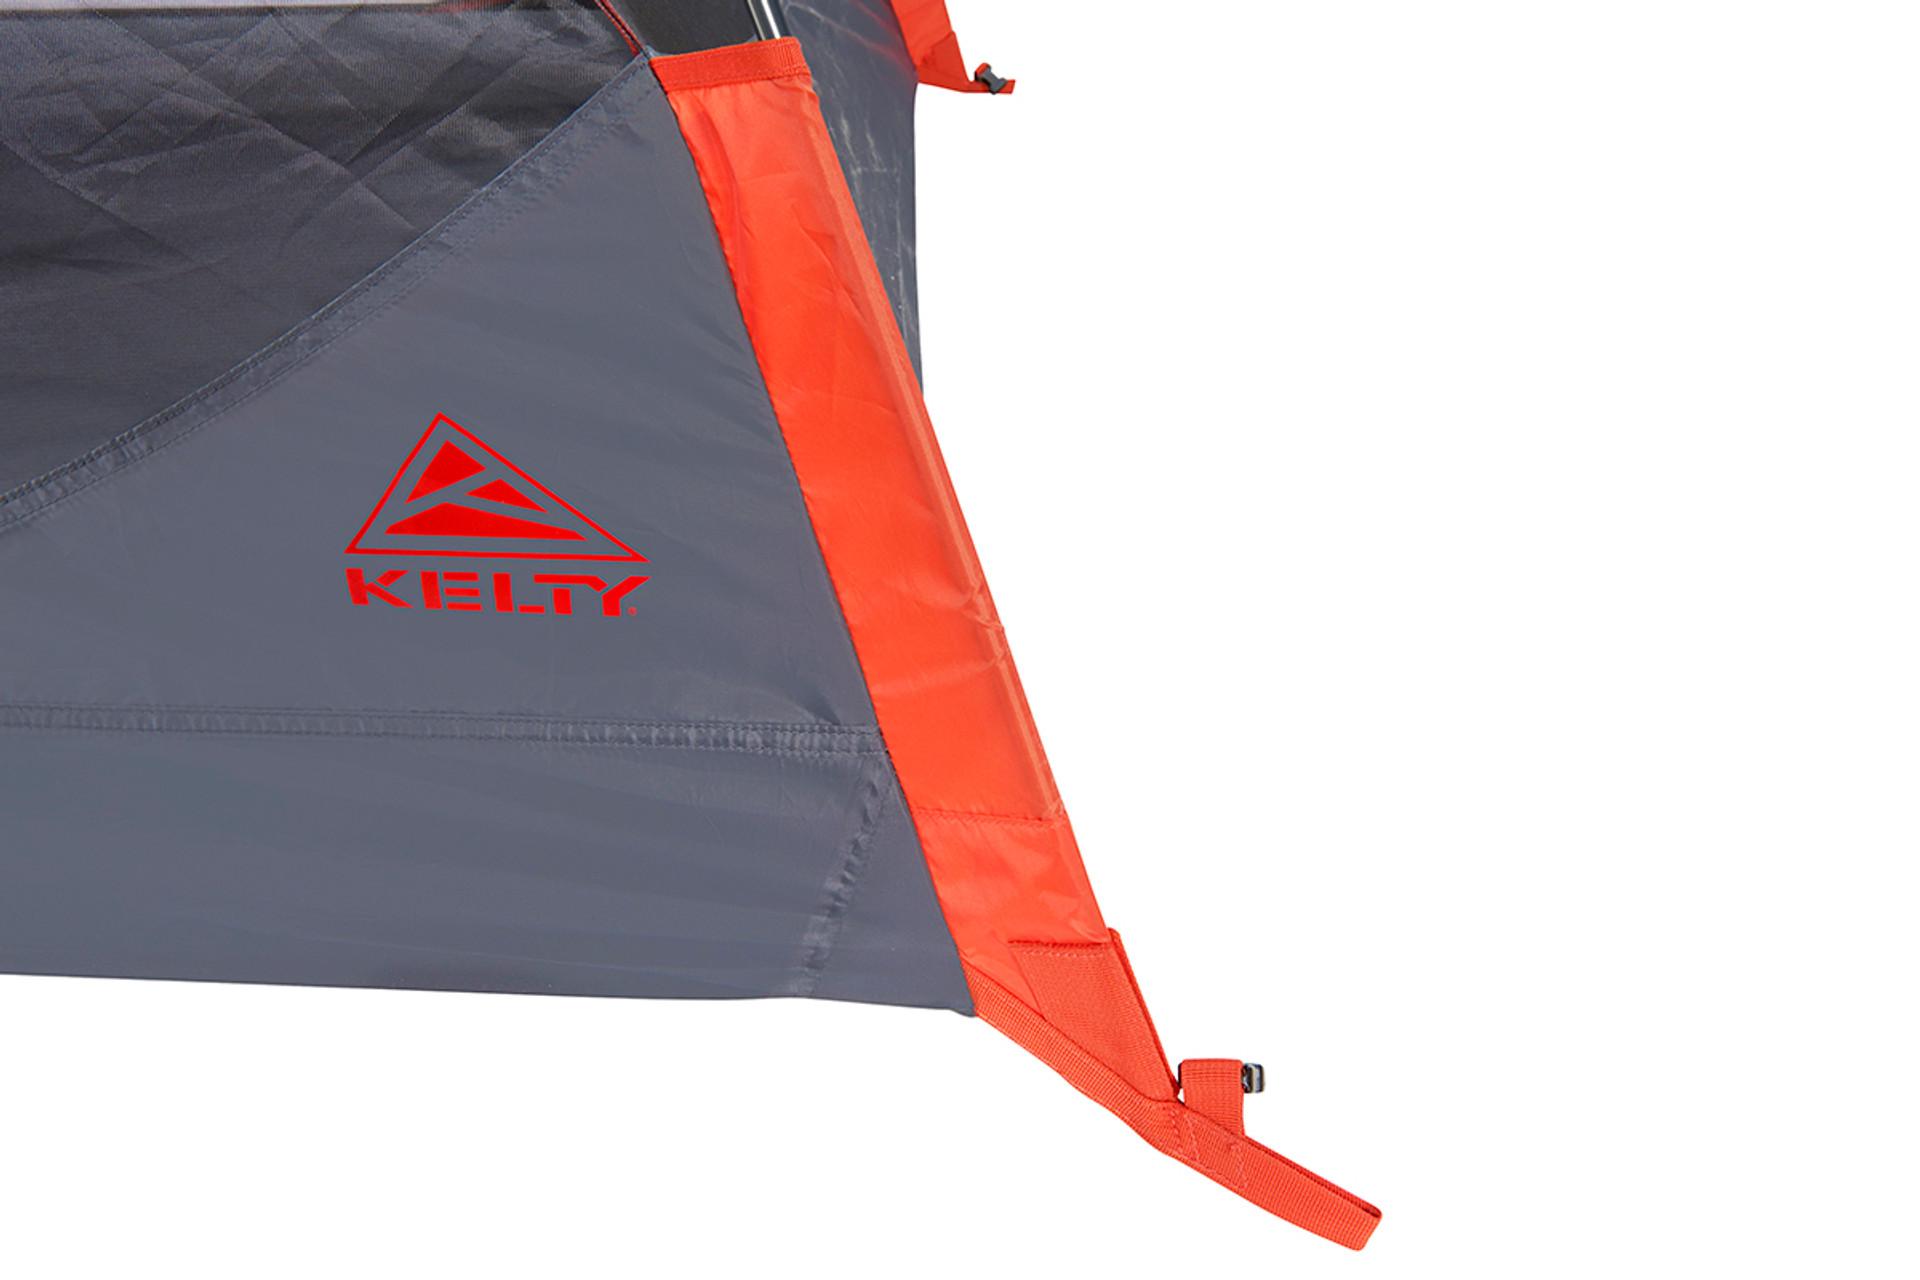 Kelty Late Start Footprint